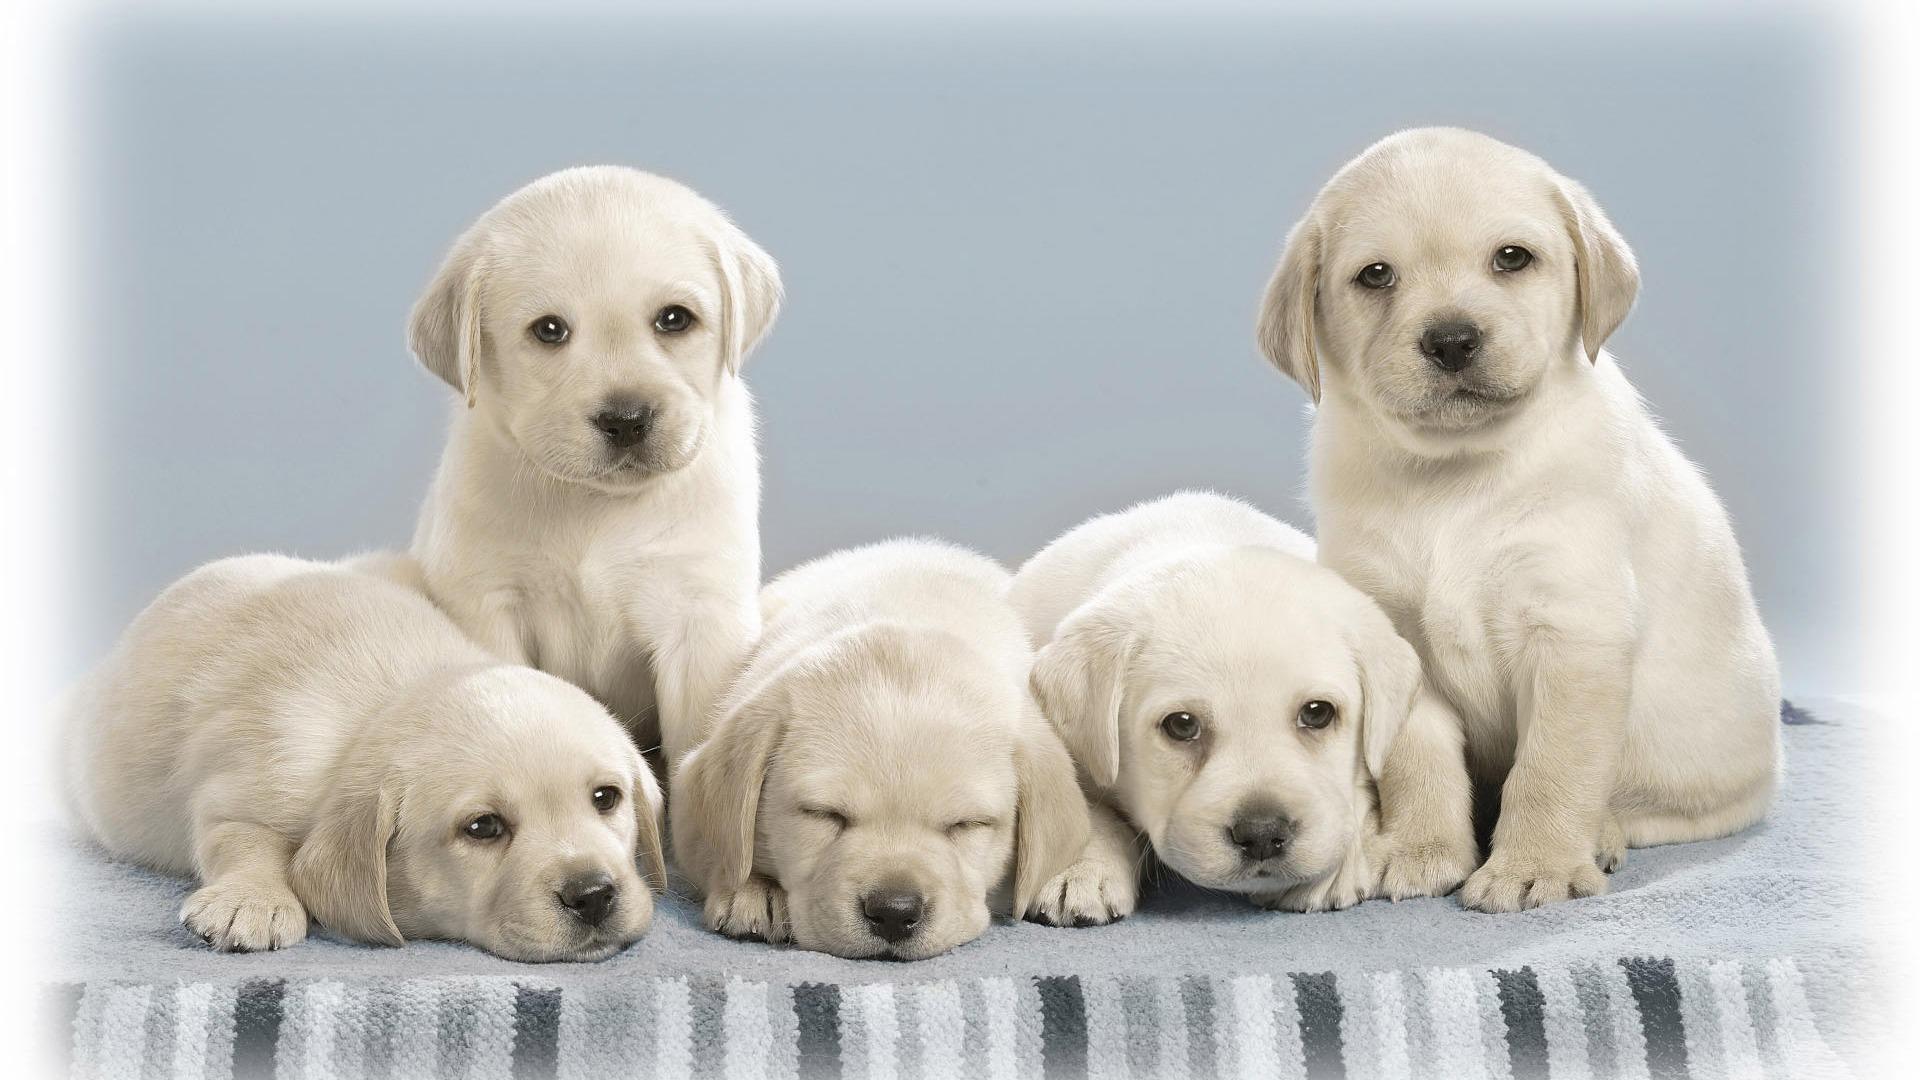 Cute Puppy Photo Wallpaper 18 1920x1080 Wallpaper Download Cute